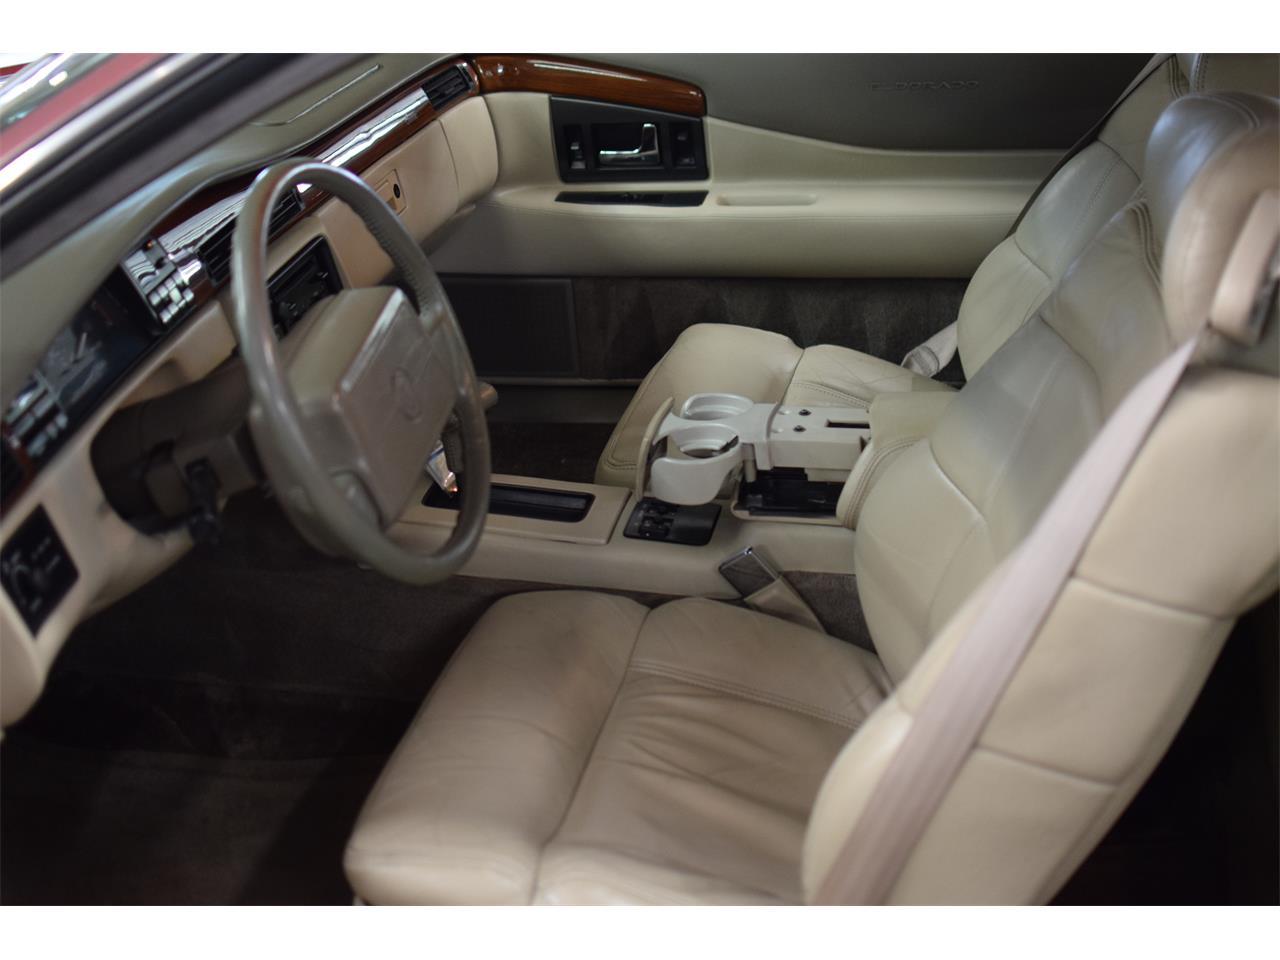 1993 Cadillac Eldorado (CC-1353604) for sale in Watertown, Minnesota